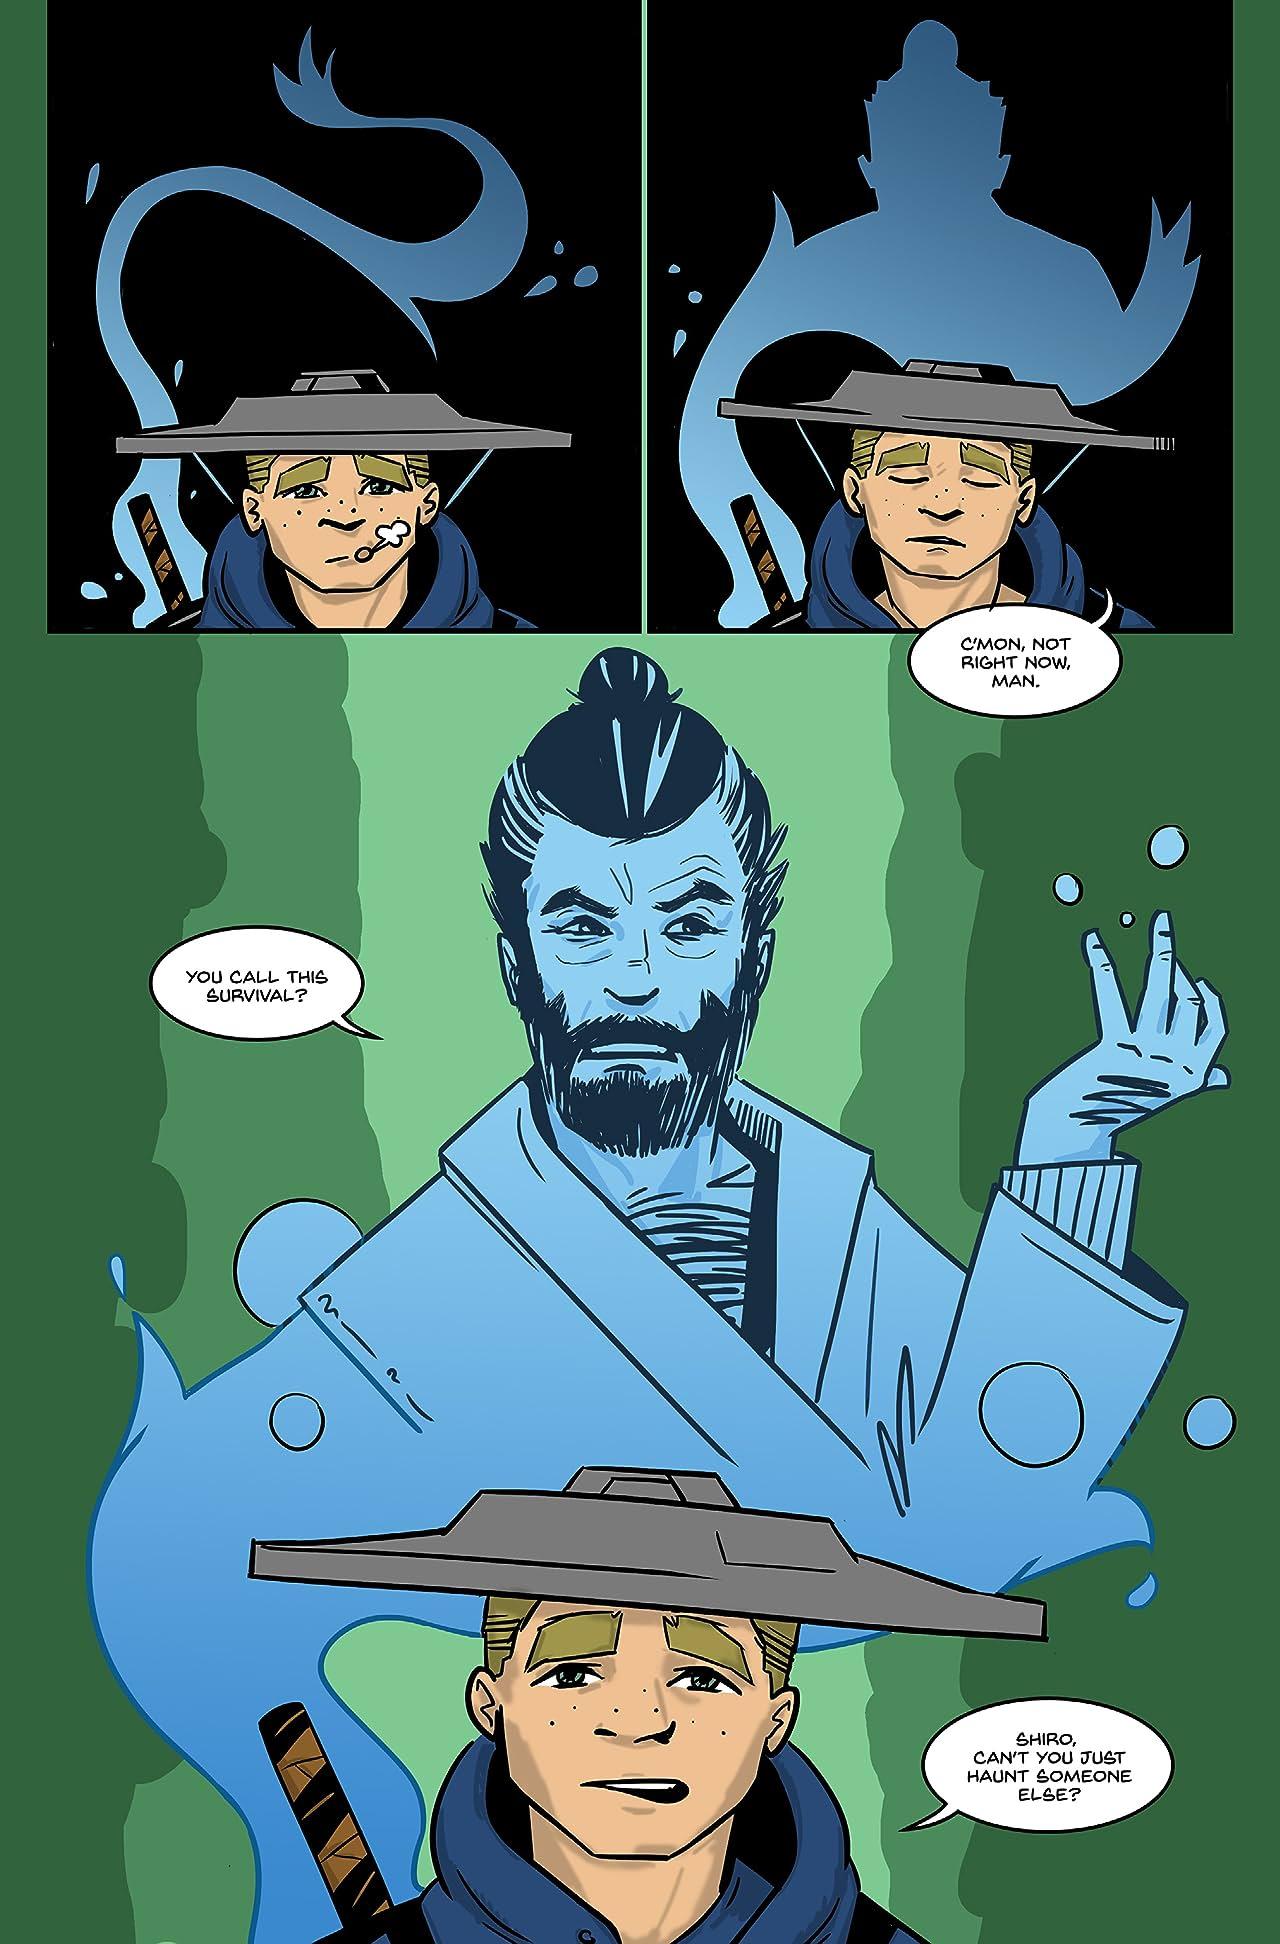 Trailer Park Samurai #3